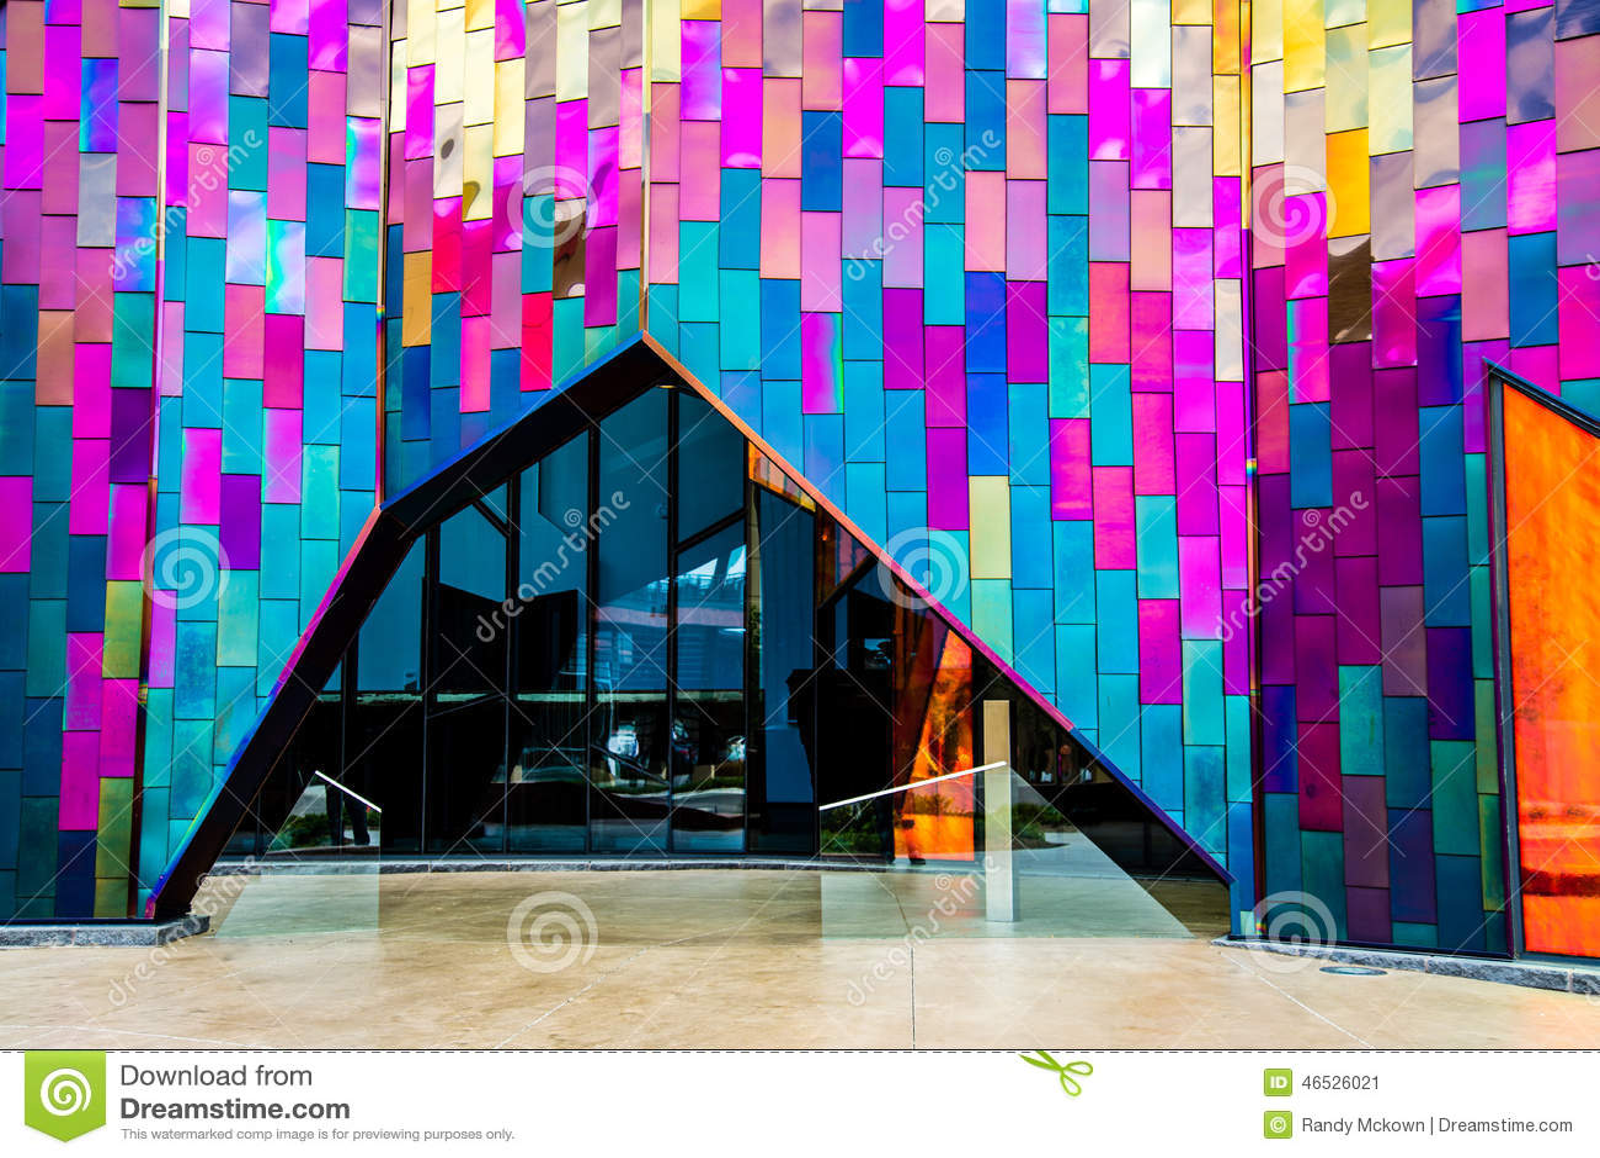 Eingang im modernen Architektur-Museum in Kansas City